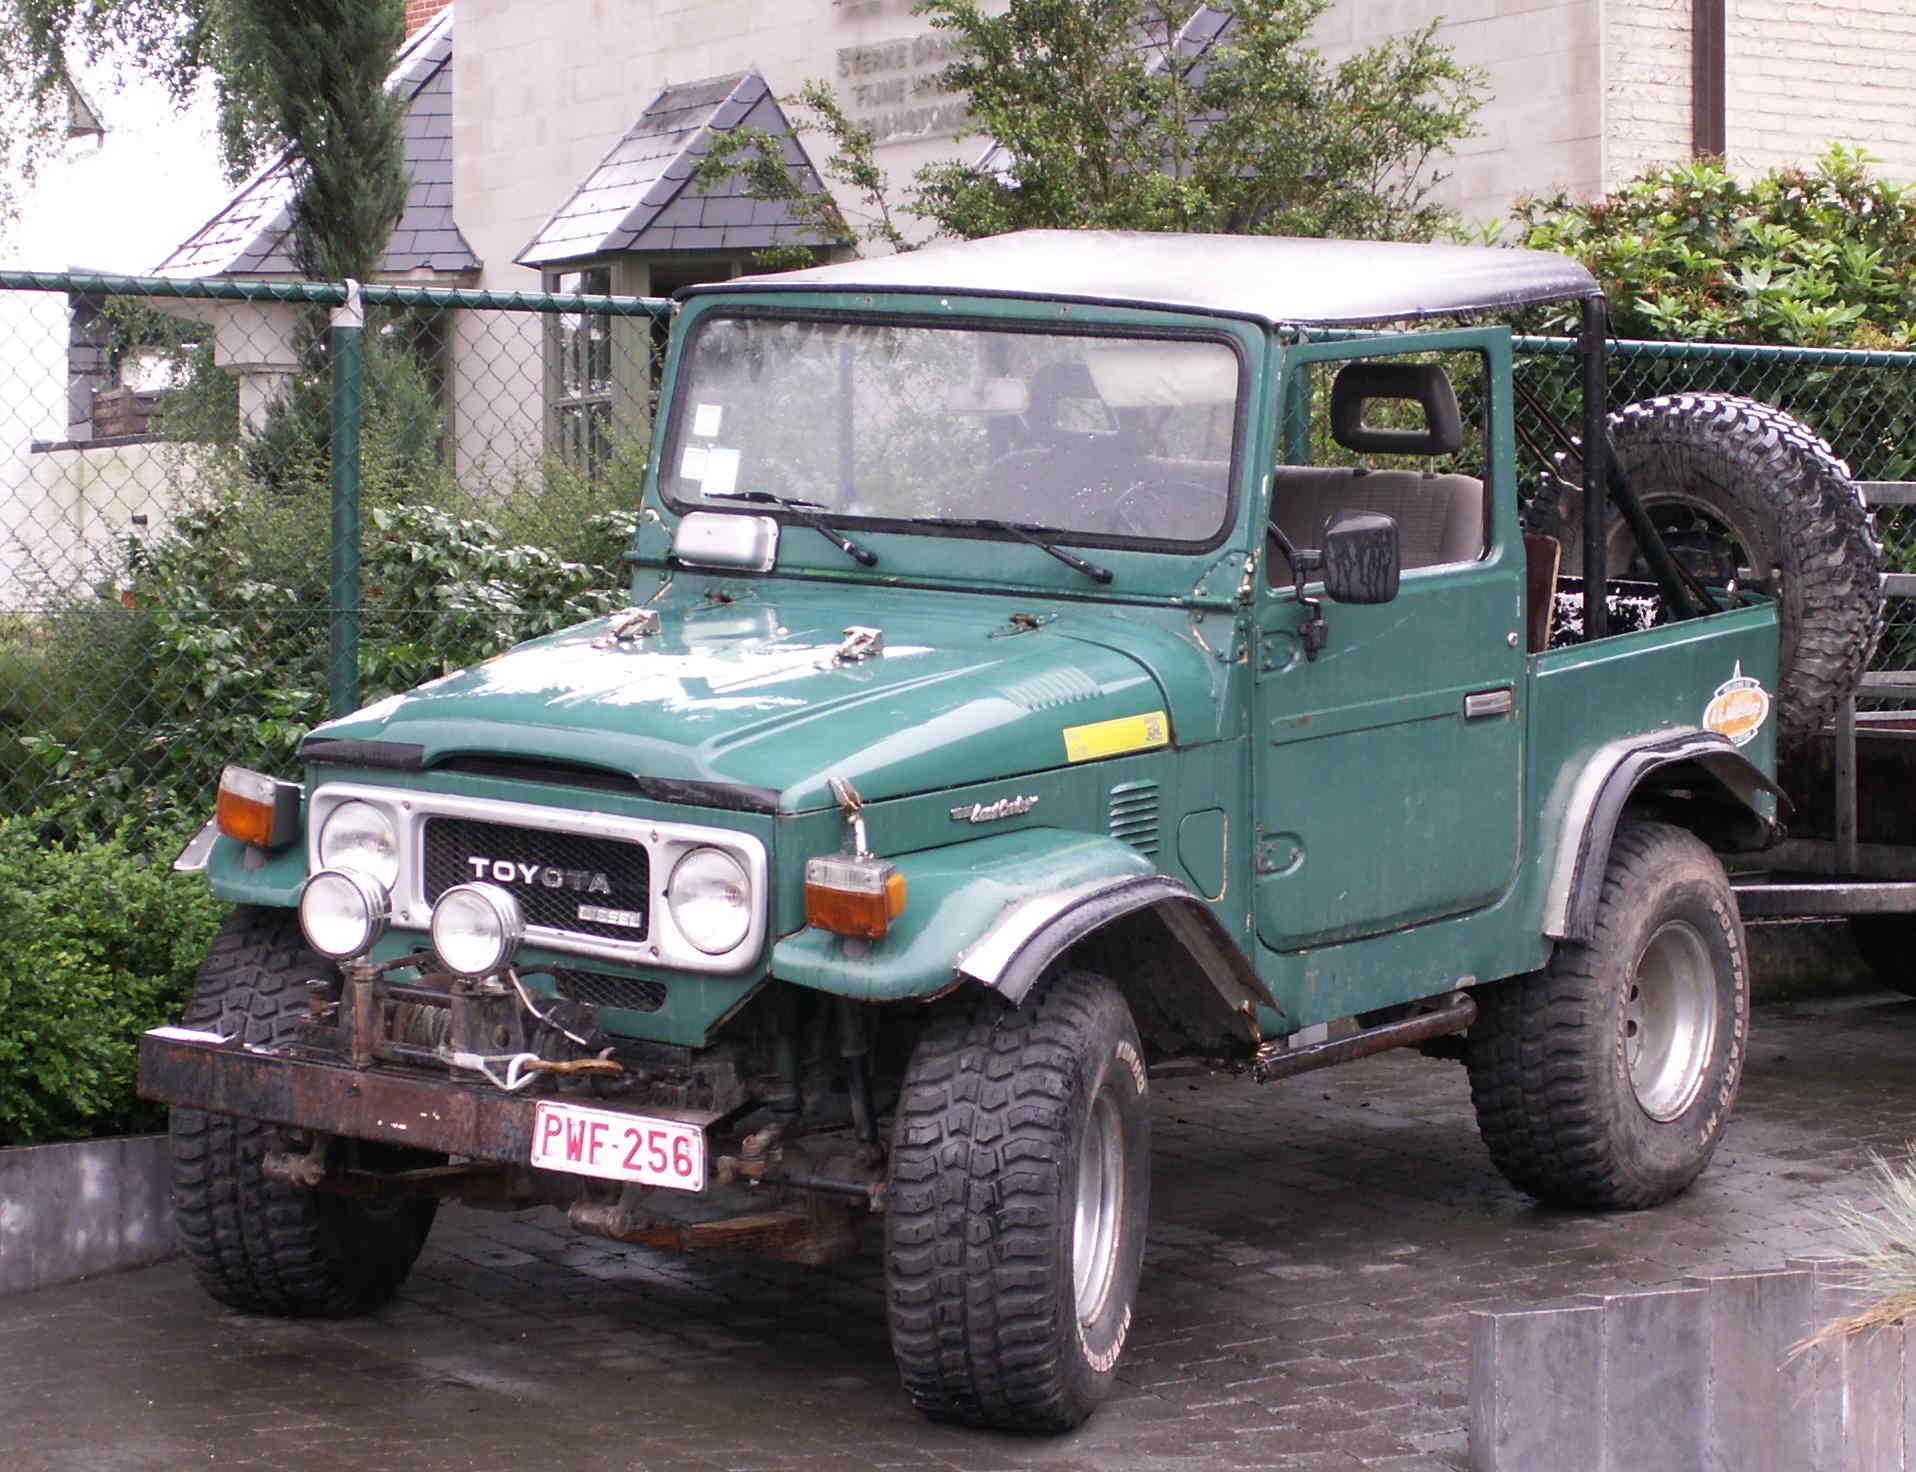 Toyota Land Cruiser Wiki >> File:Toyota landcruiser convertible.jpg - Wikimedia Commons